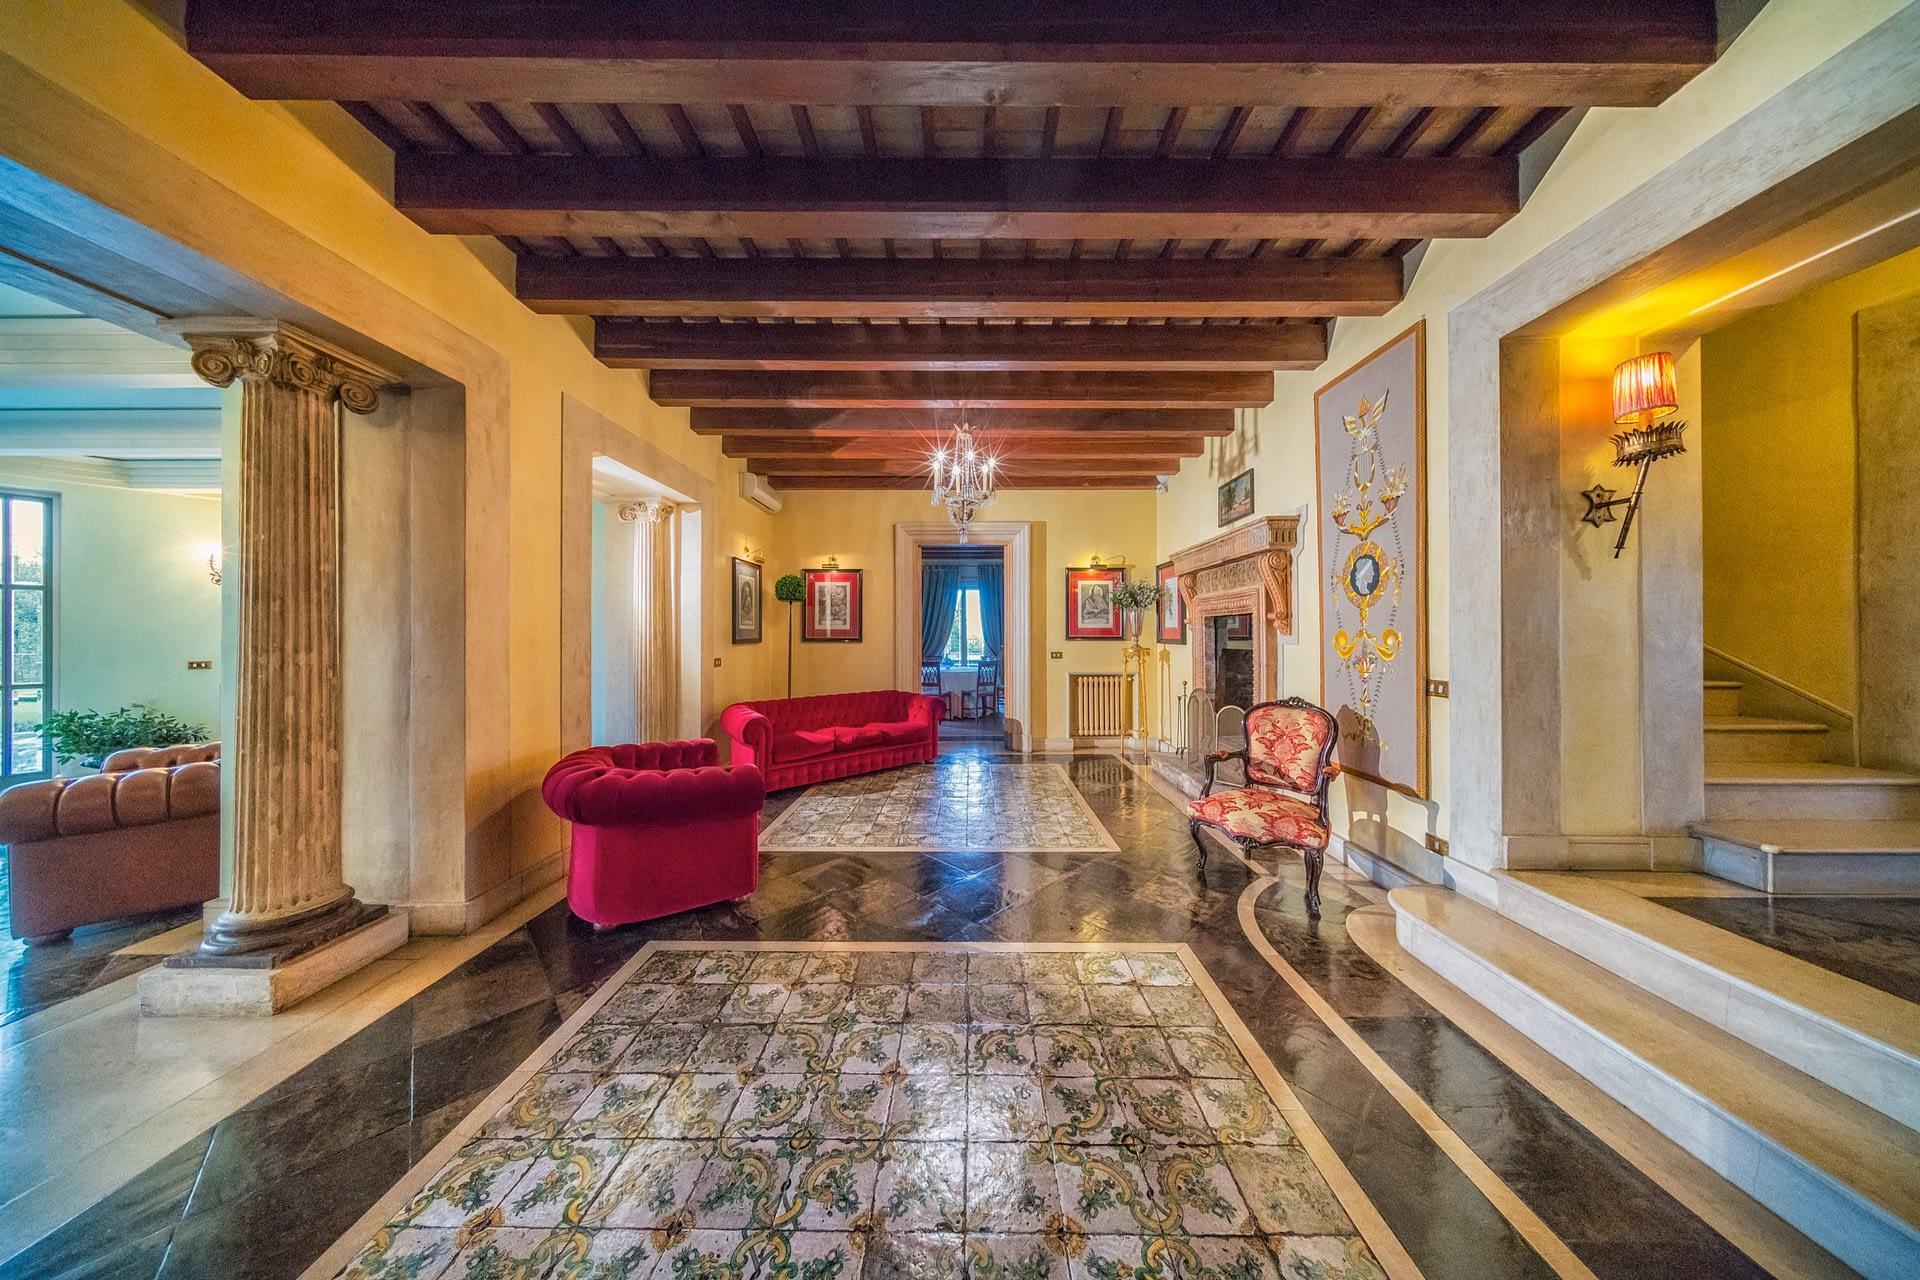 Pierluigi Cavarra - fotografo de Inmobiliaria - real estate photography costa blanca - ejemplo 6